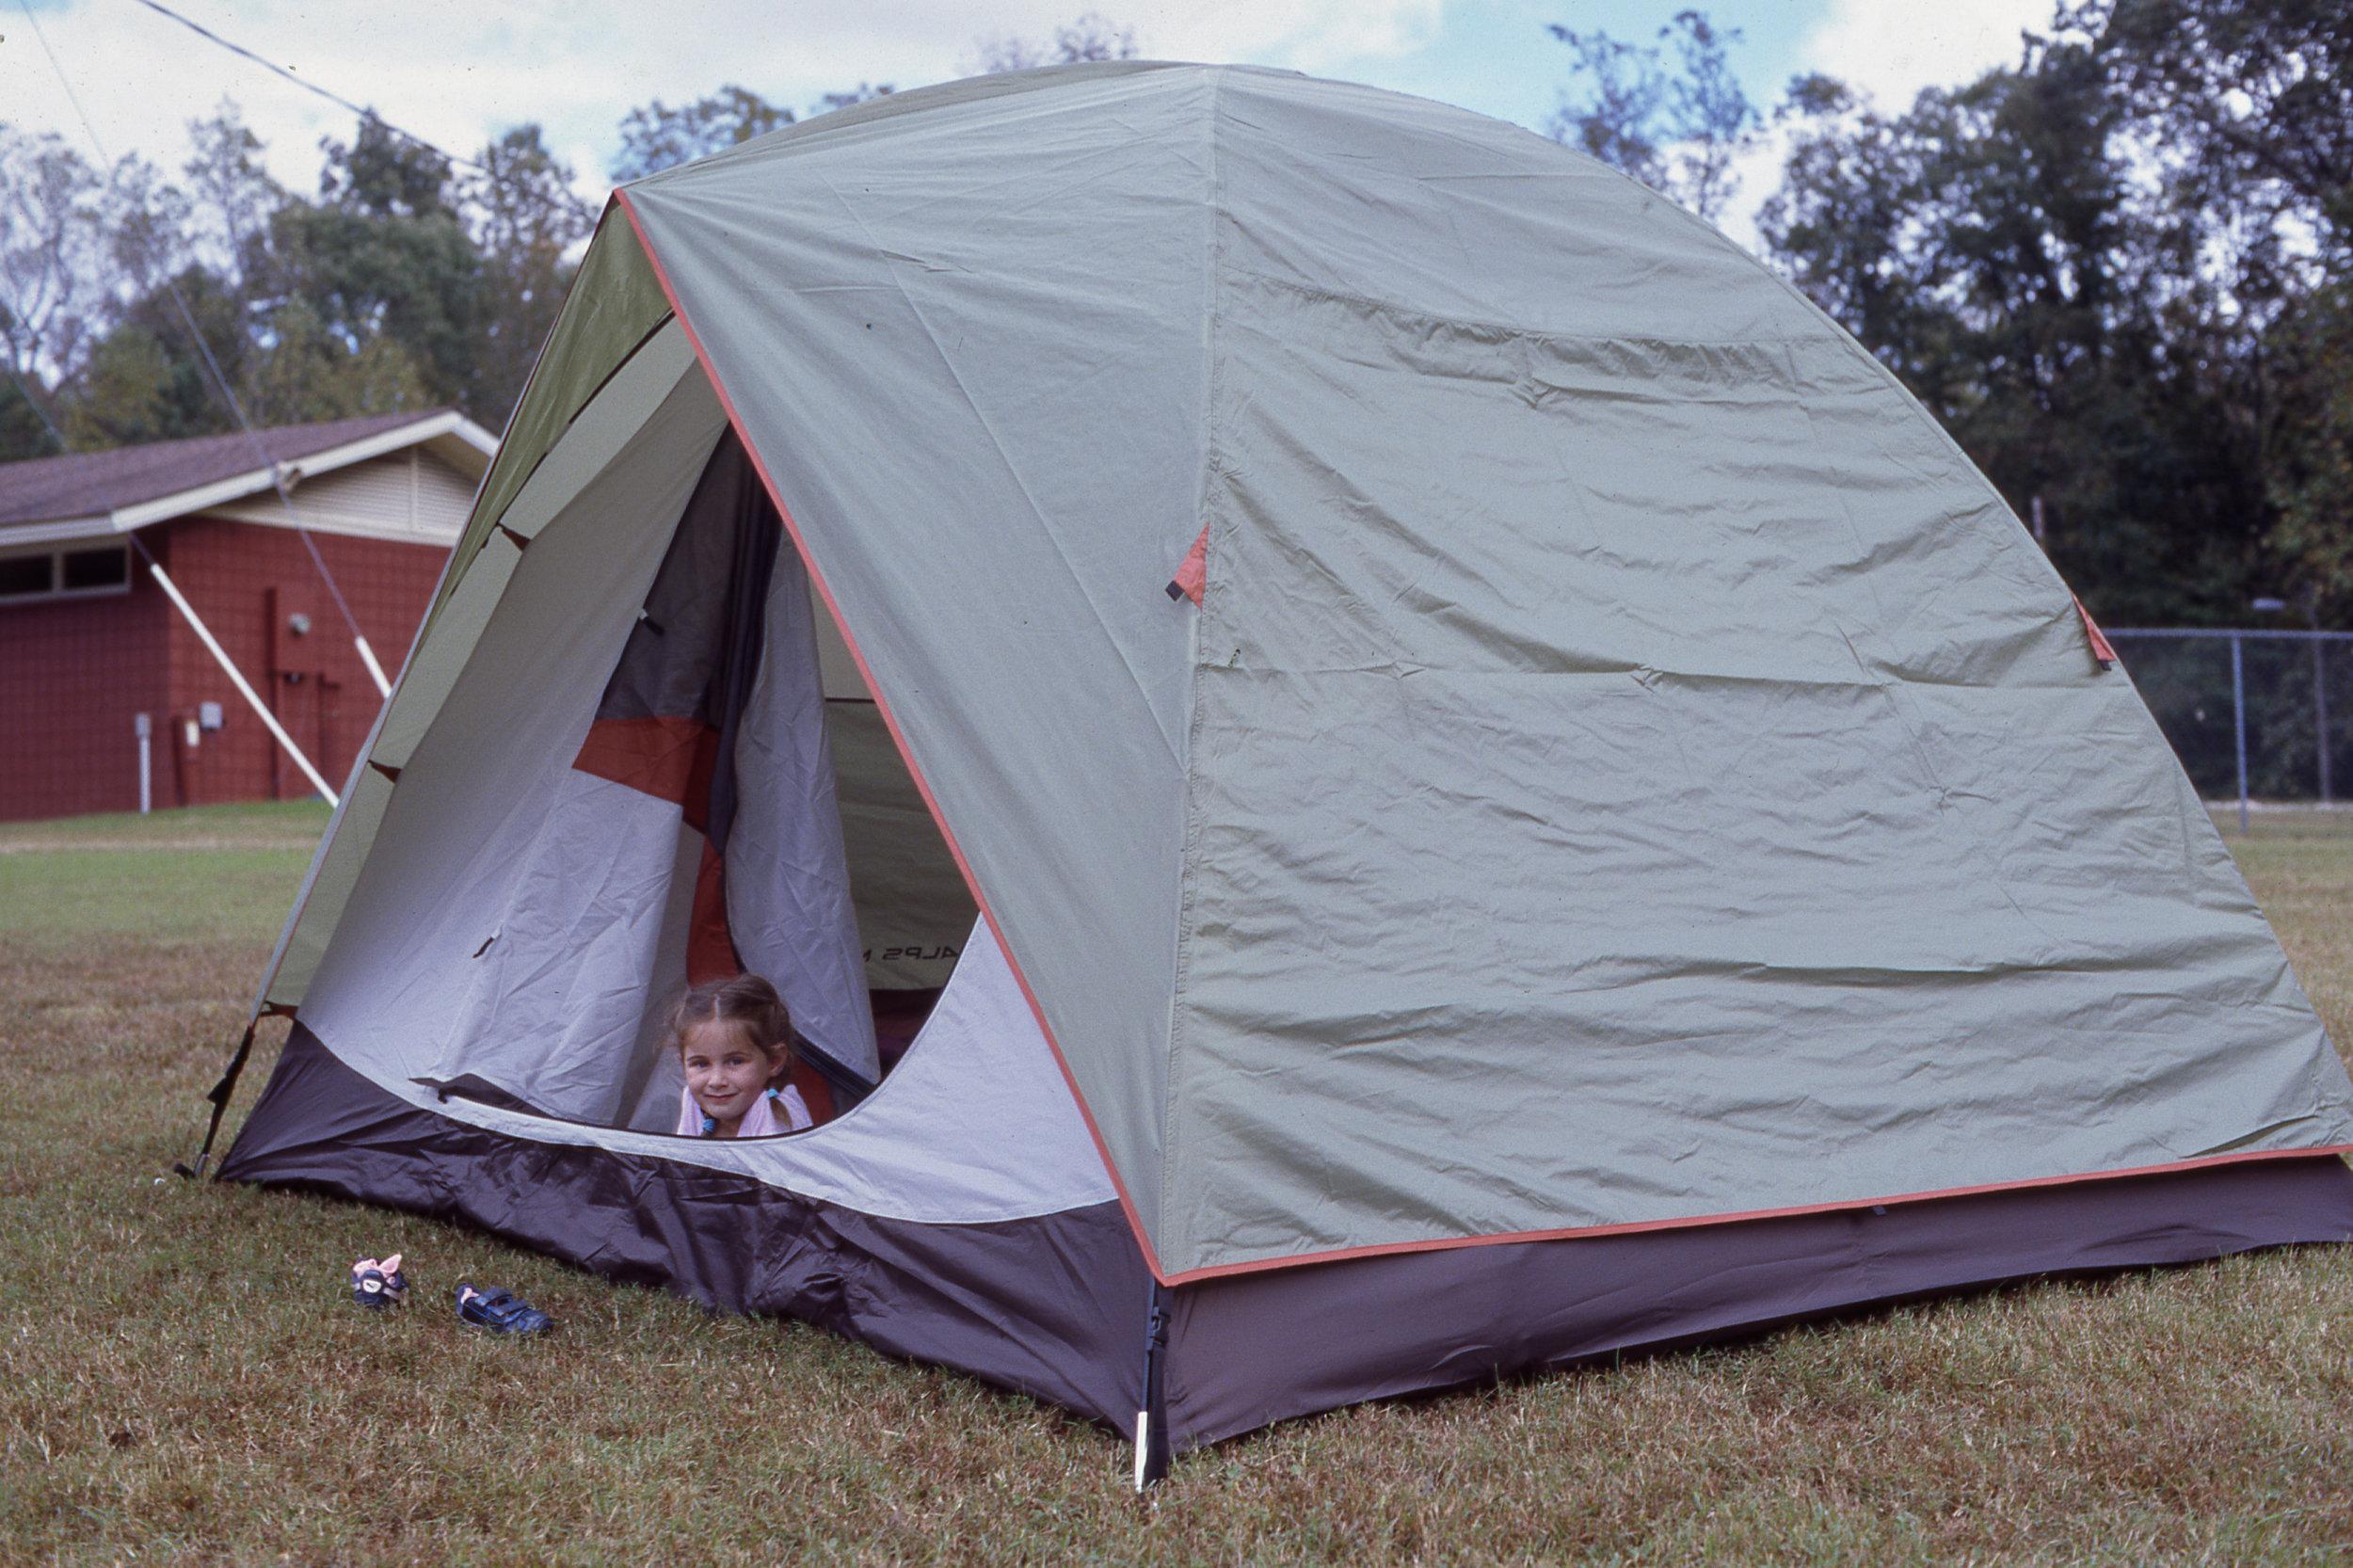 e100_camping102018_012.jpg